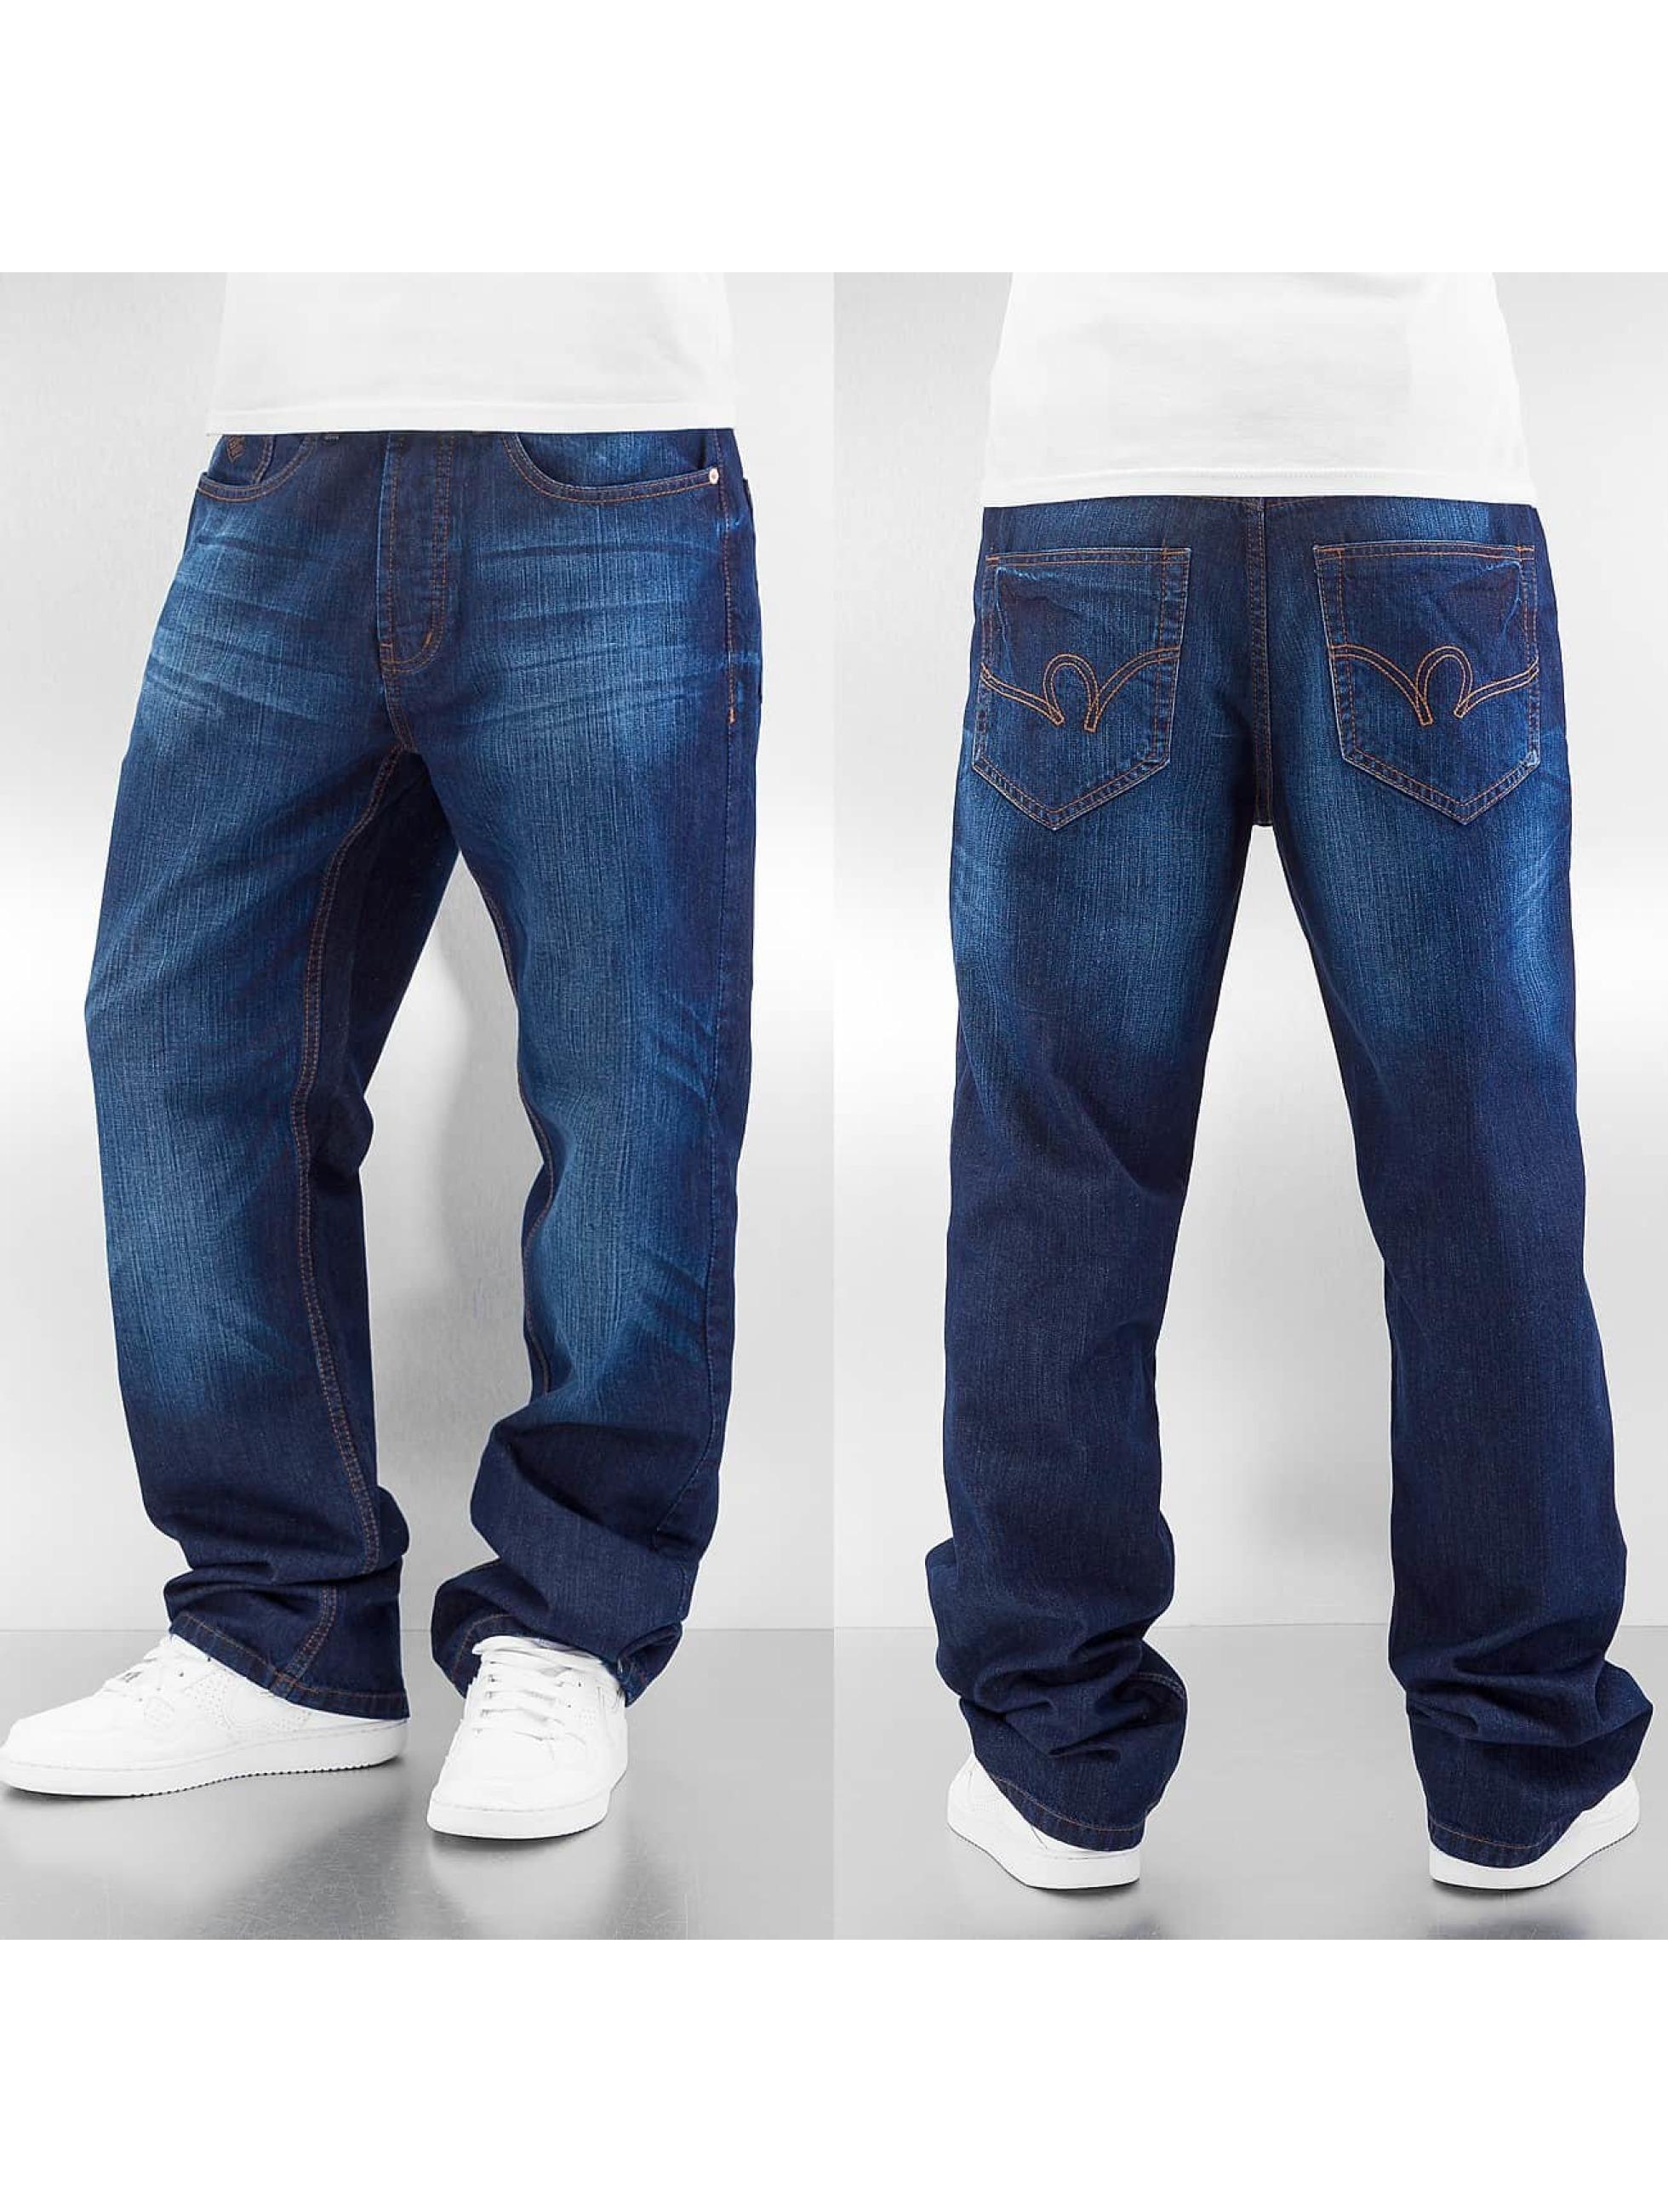 Rocawear Loose Fit Jeans Anniv Stitching blau